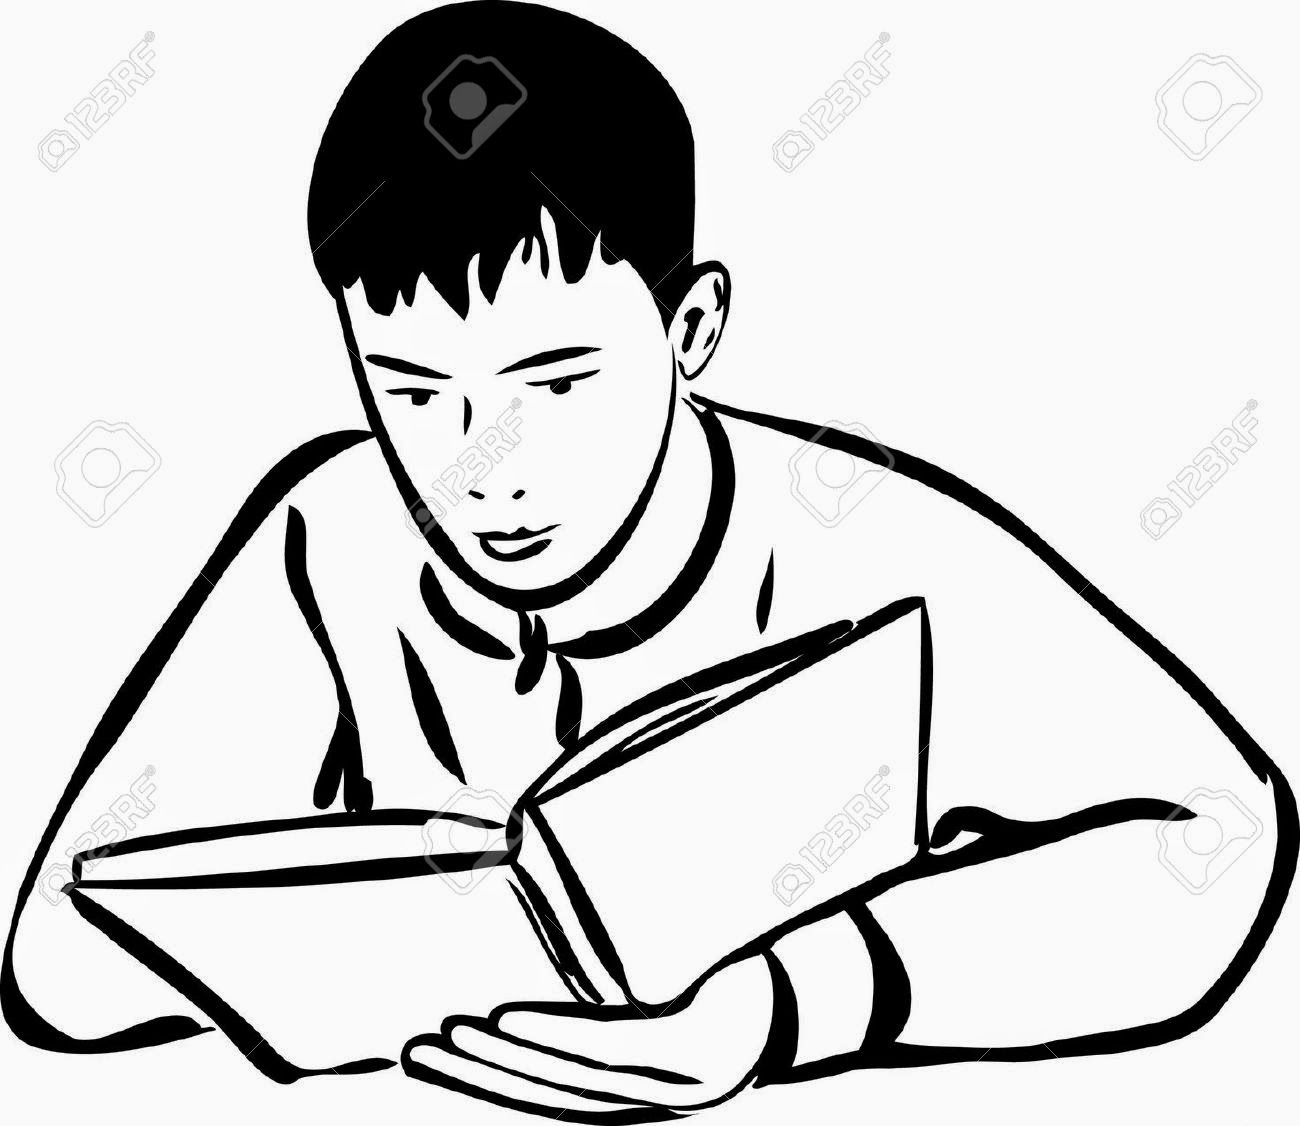 nibandh on adarsha vidyarthi in hindi Adarsh vidyarthi essay in hindi pdf  hindi story for children with moral  ek adarsh vidyarthi par nibandh in education channel why ritashu - duration: .